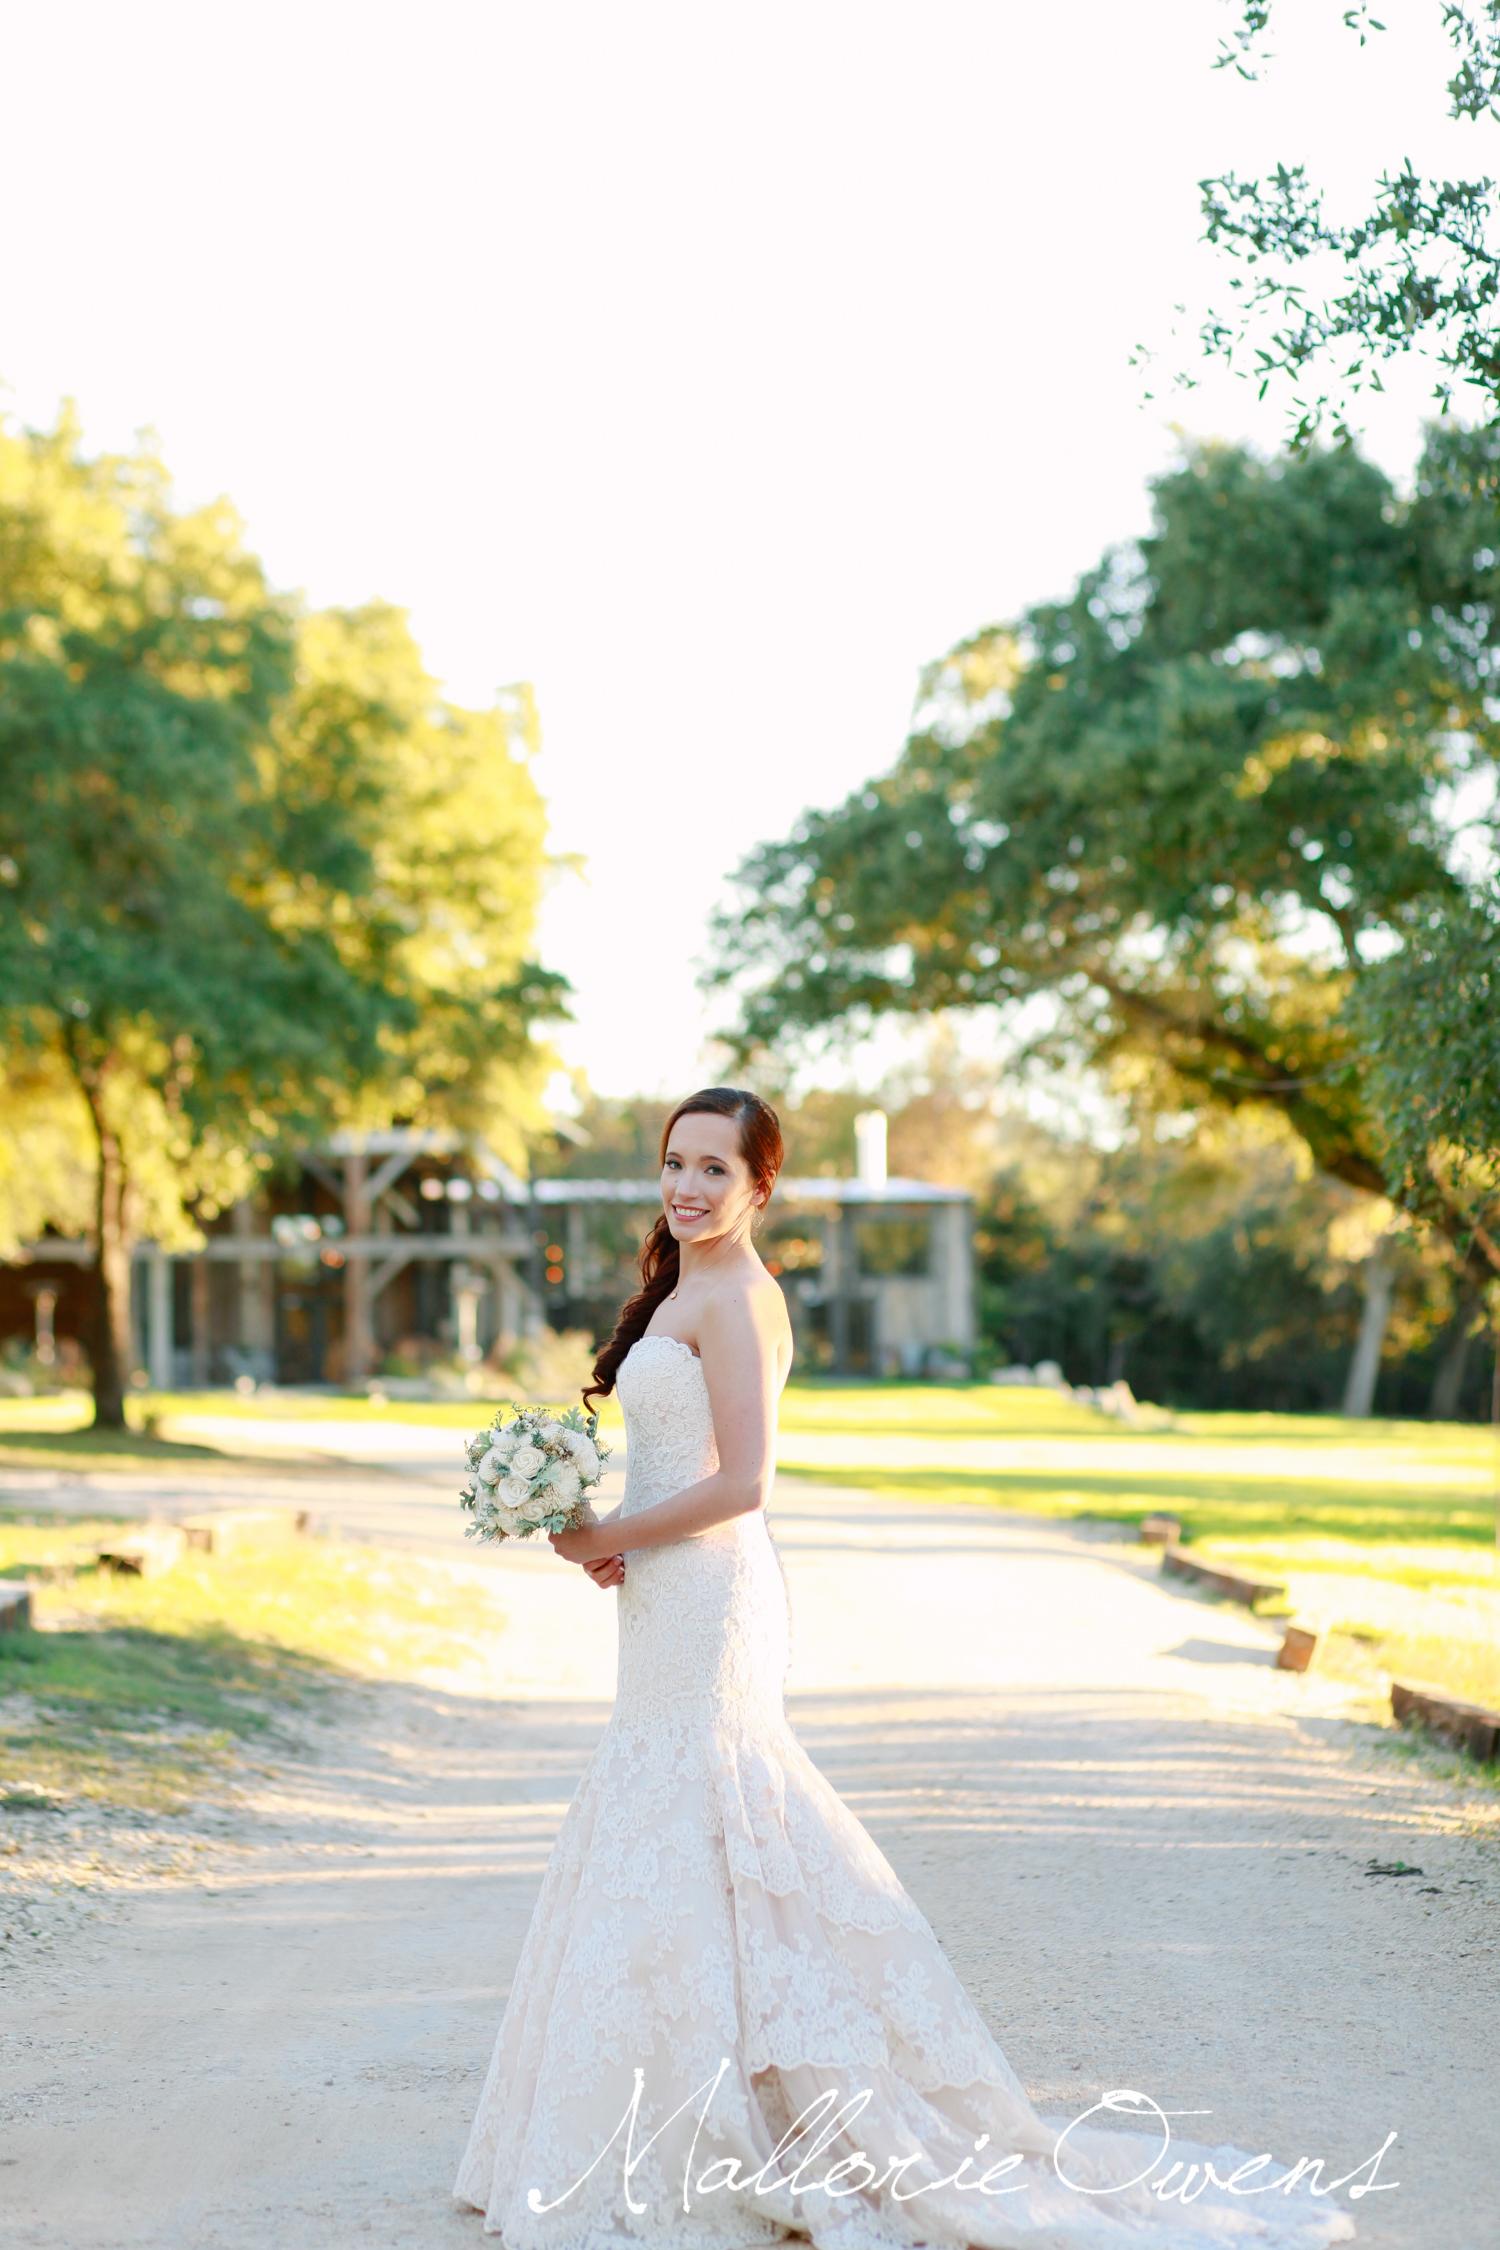 Austin Wedding Photographer, The Creek Haus | MALLORIE OWENS